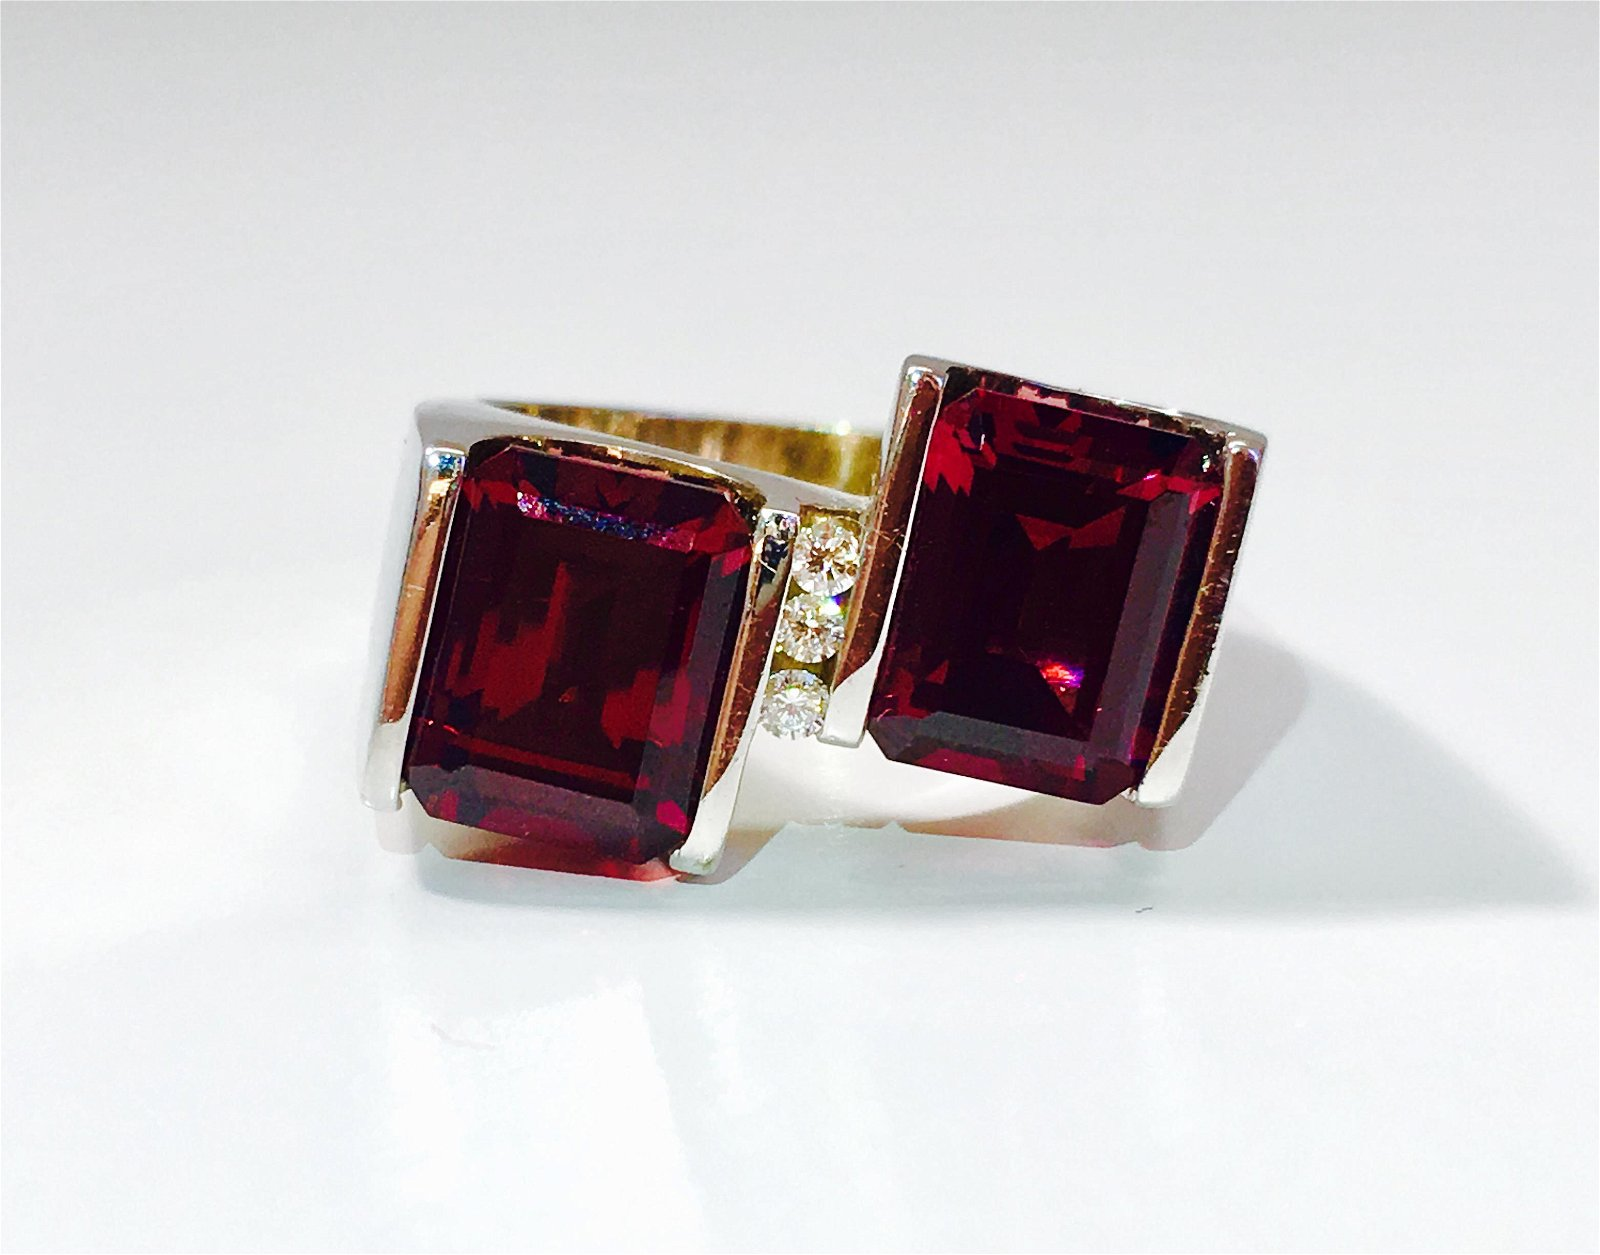 14K Gold, 7 Carat Natural Garnet and Diamond Ring.